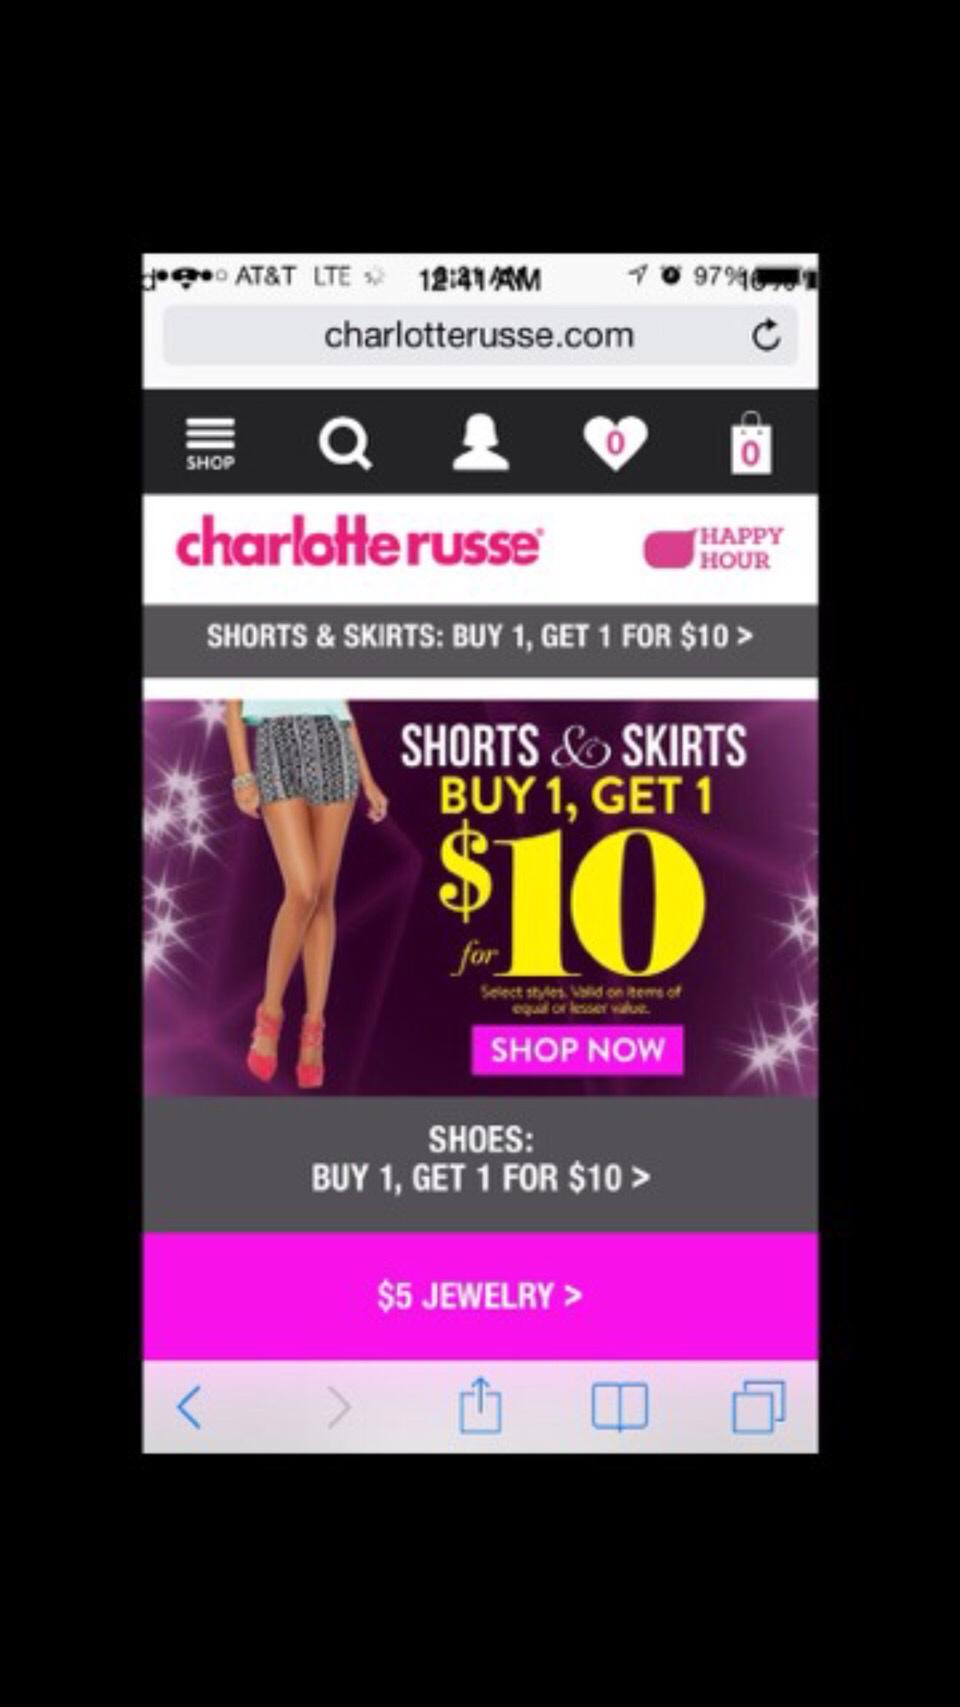 Charlotteeusse.com